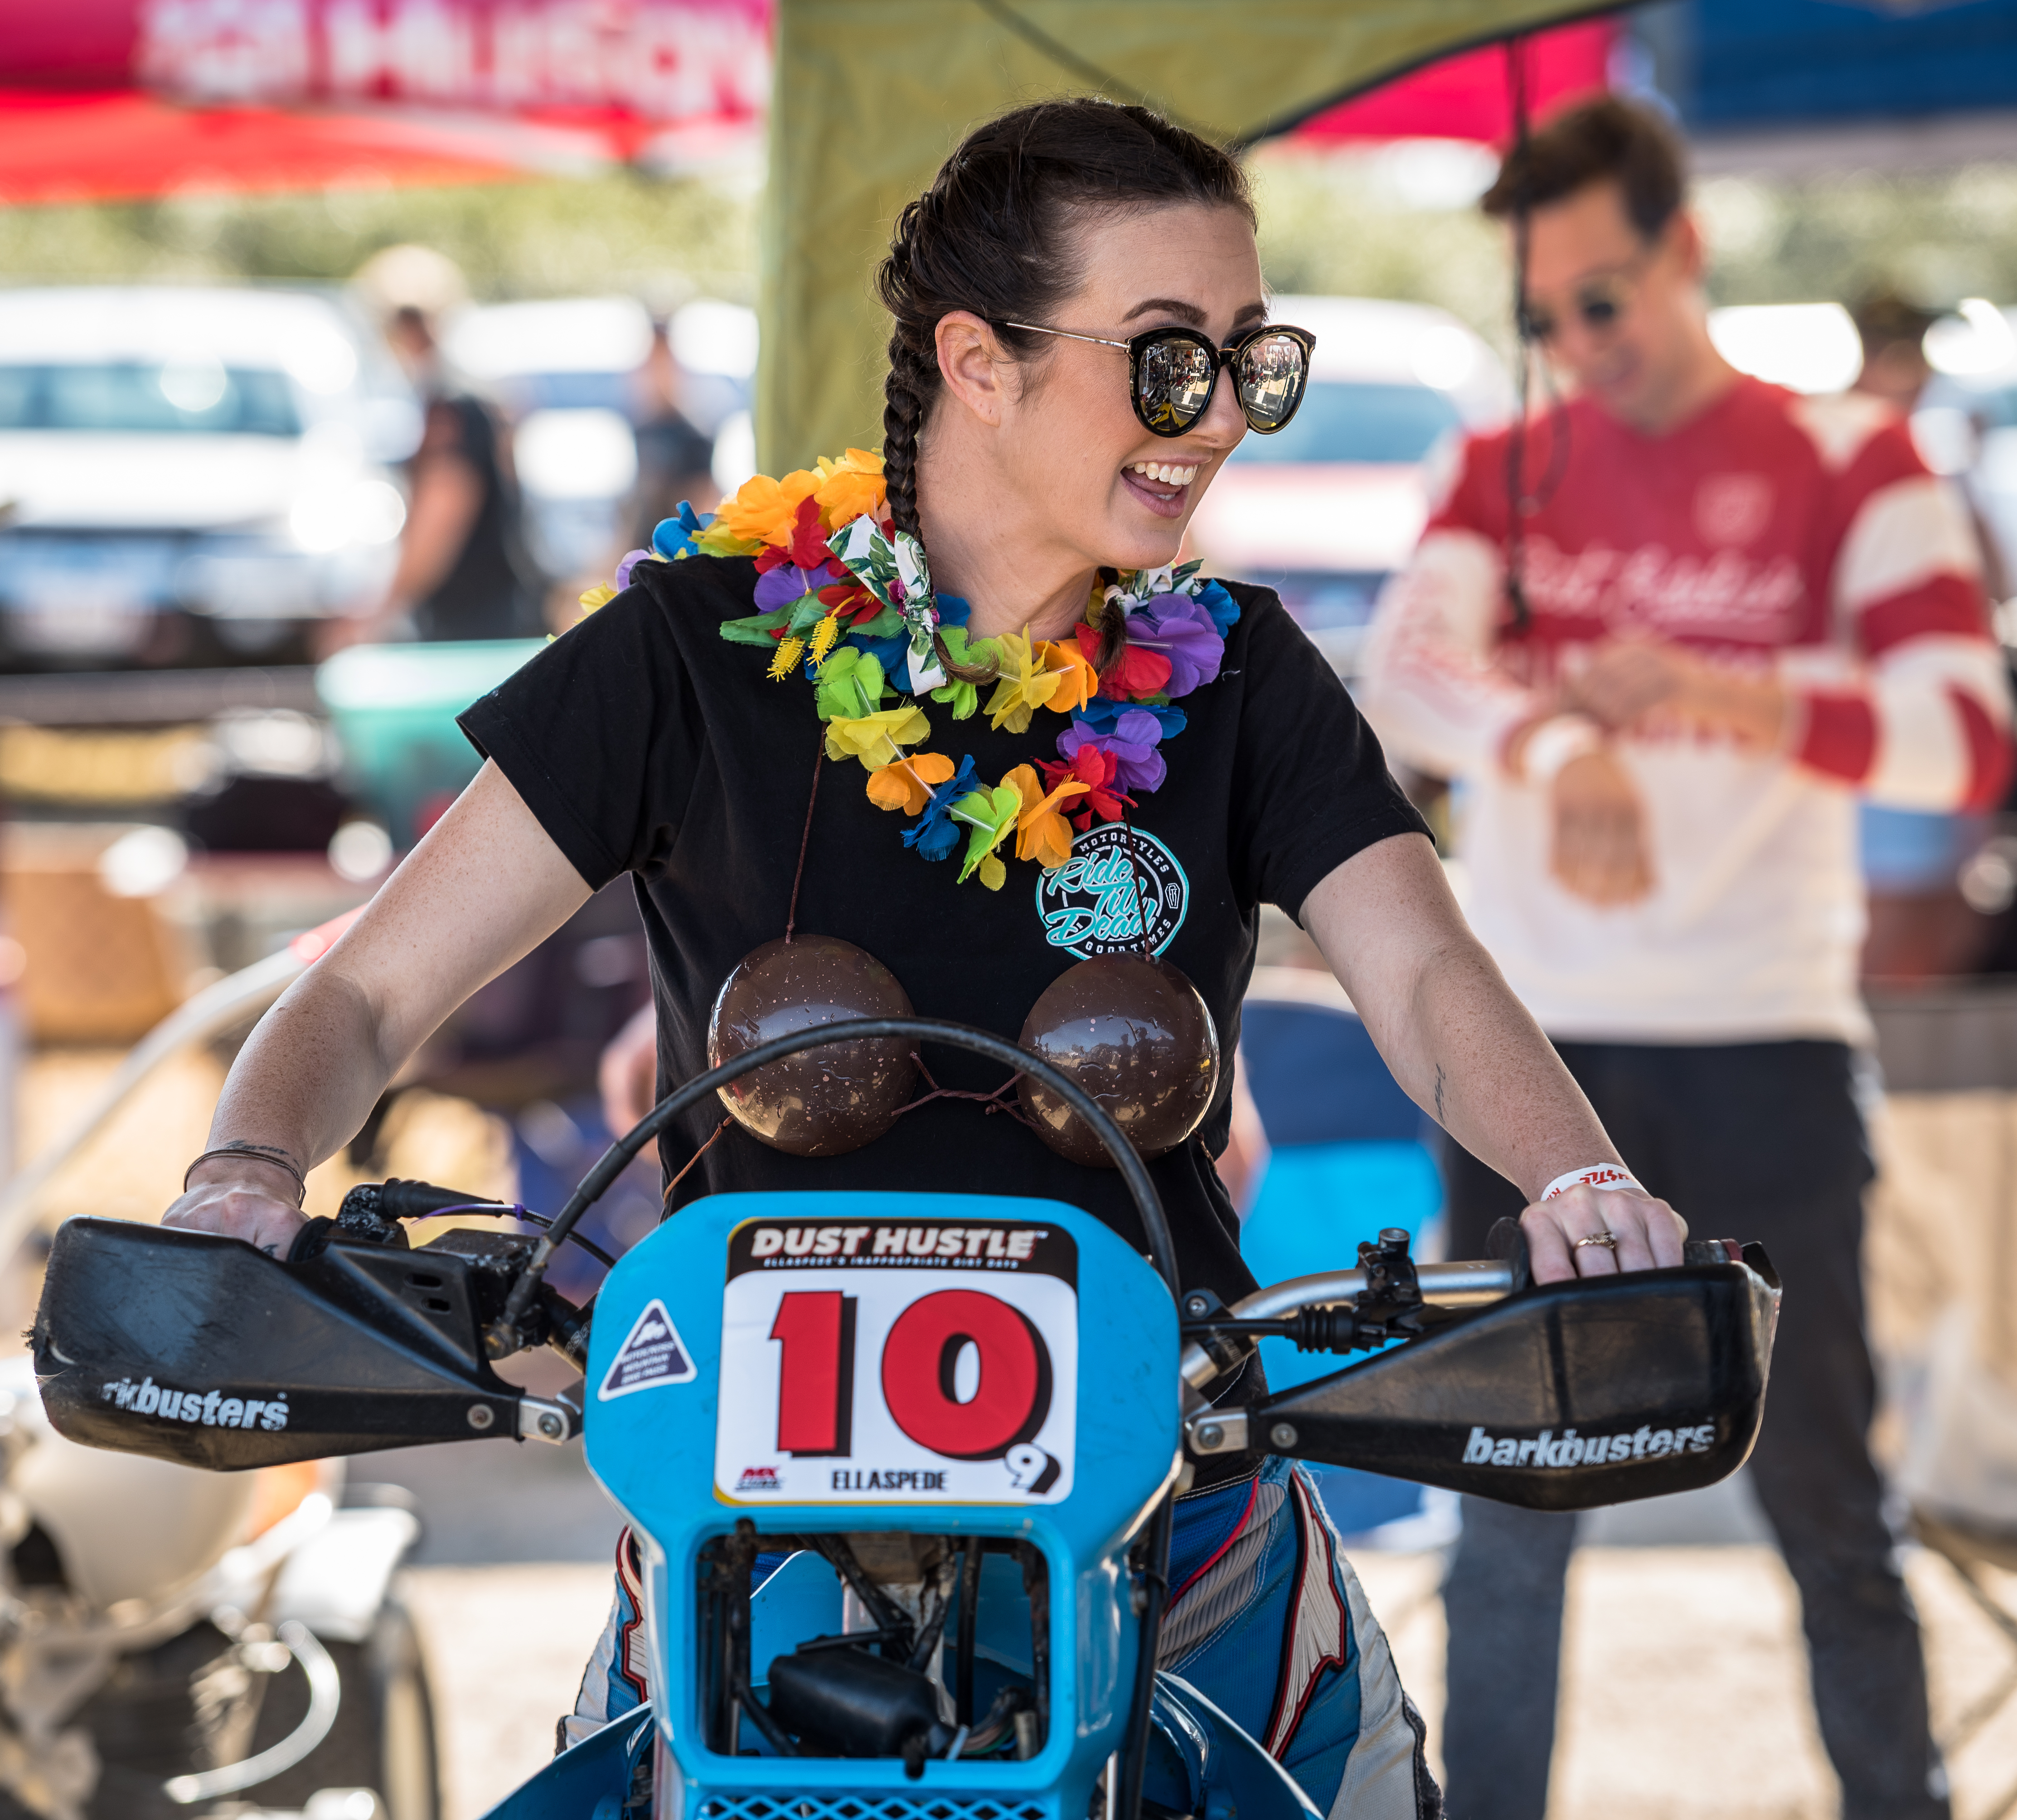 Kathleen Ferguson - Best In Class, Enduro & MX class. Photo: Motorcycle Pics